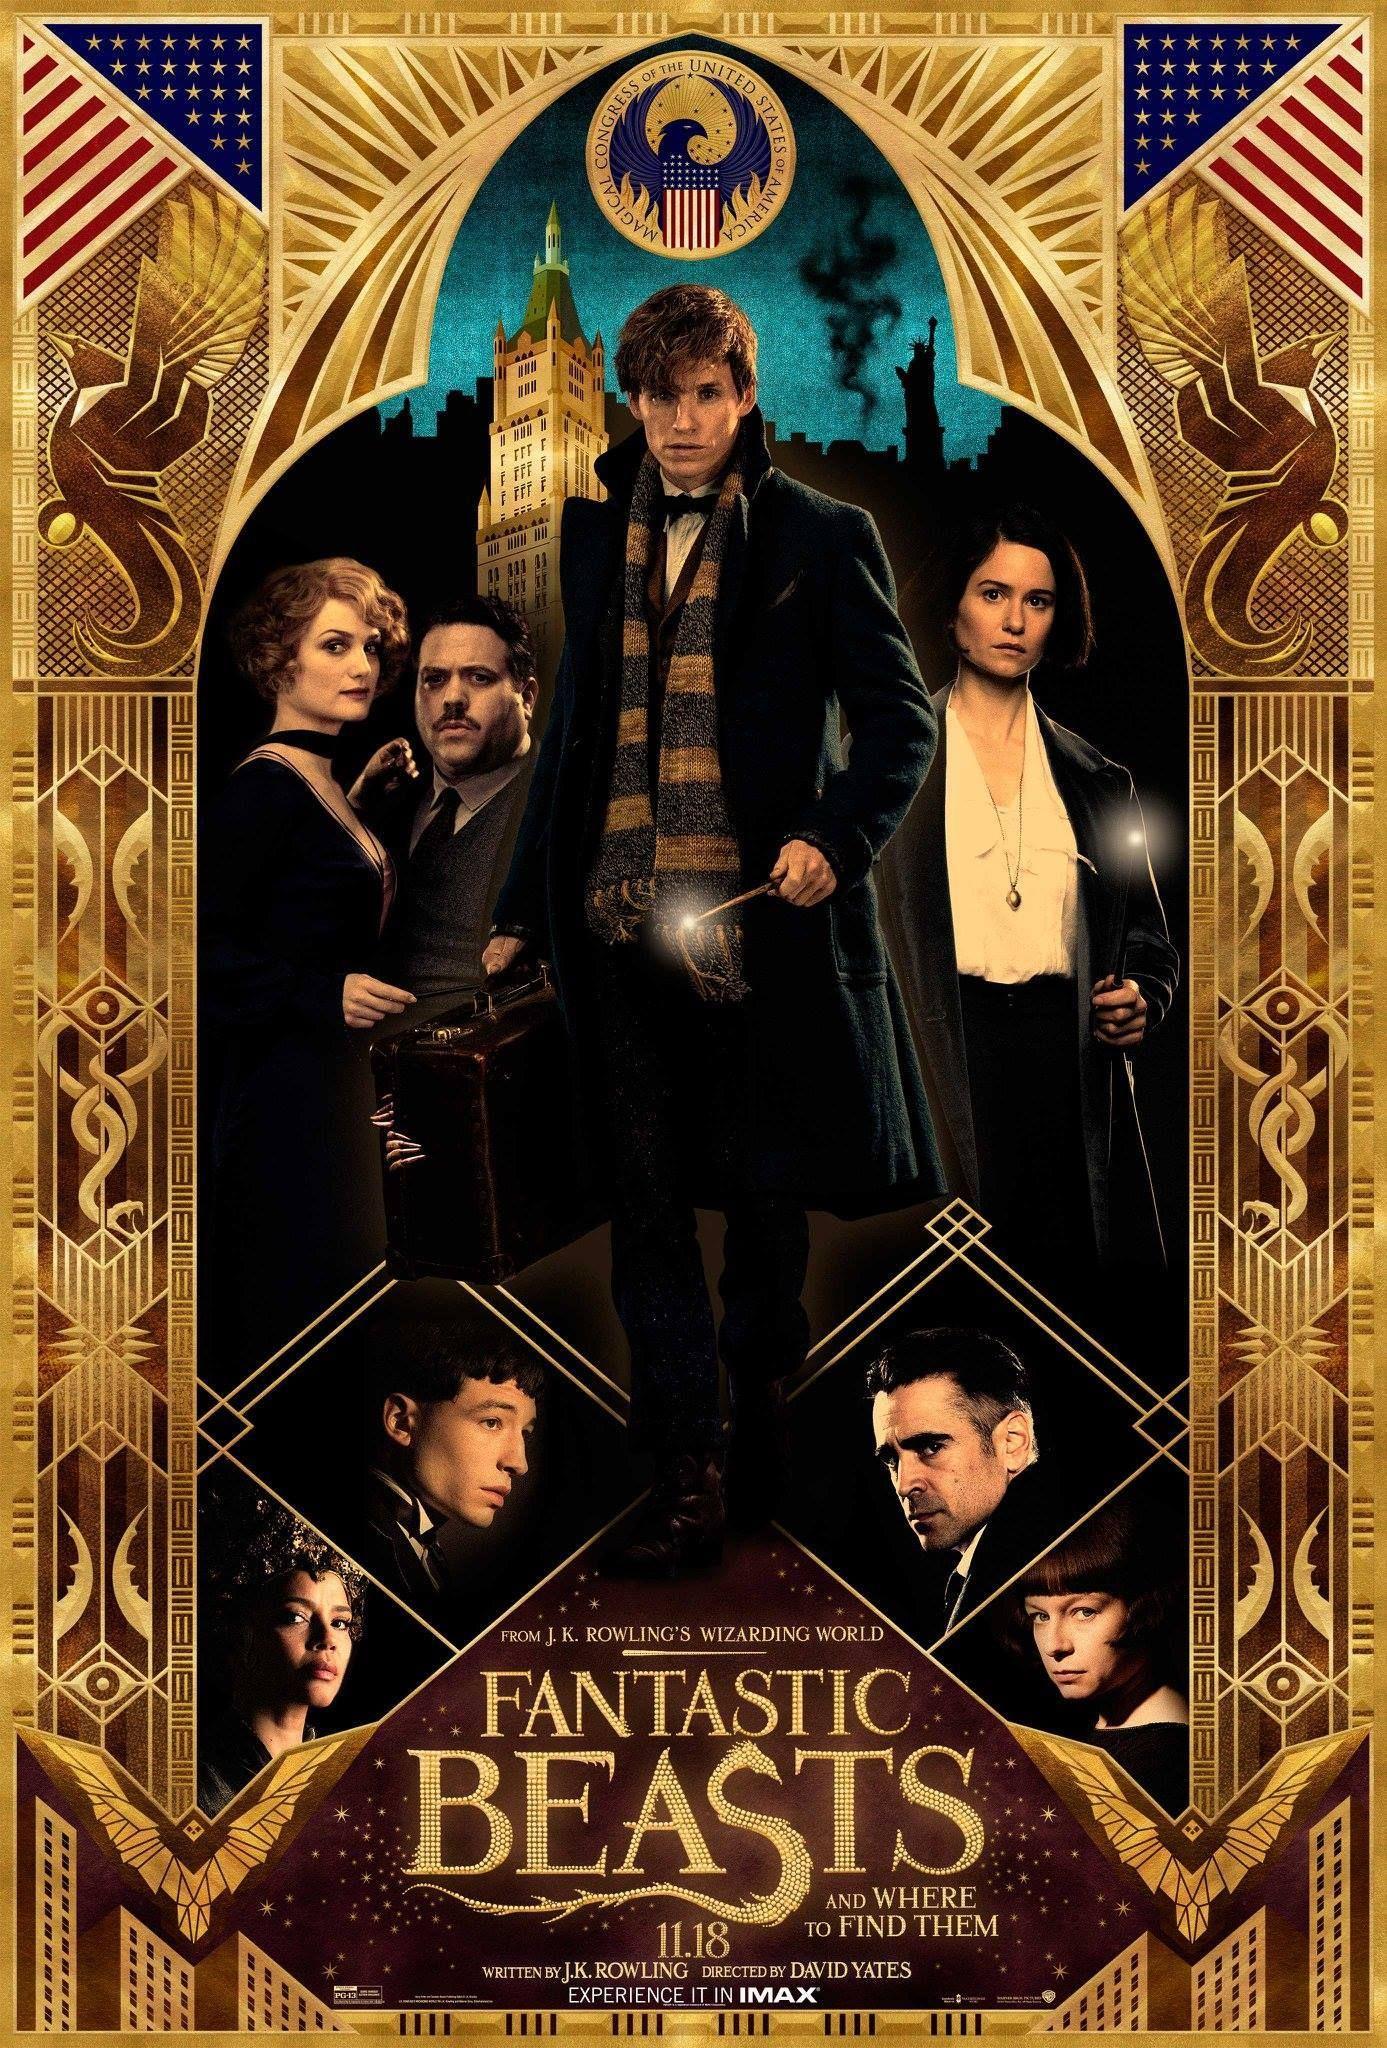 Fantastic Beasts And Where To Find Them Soooooooooooooooooo Excited Mit Bildern Phantastische Tierwesen Fantastische Tierwesen